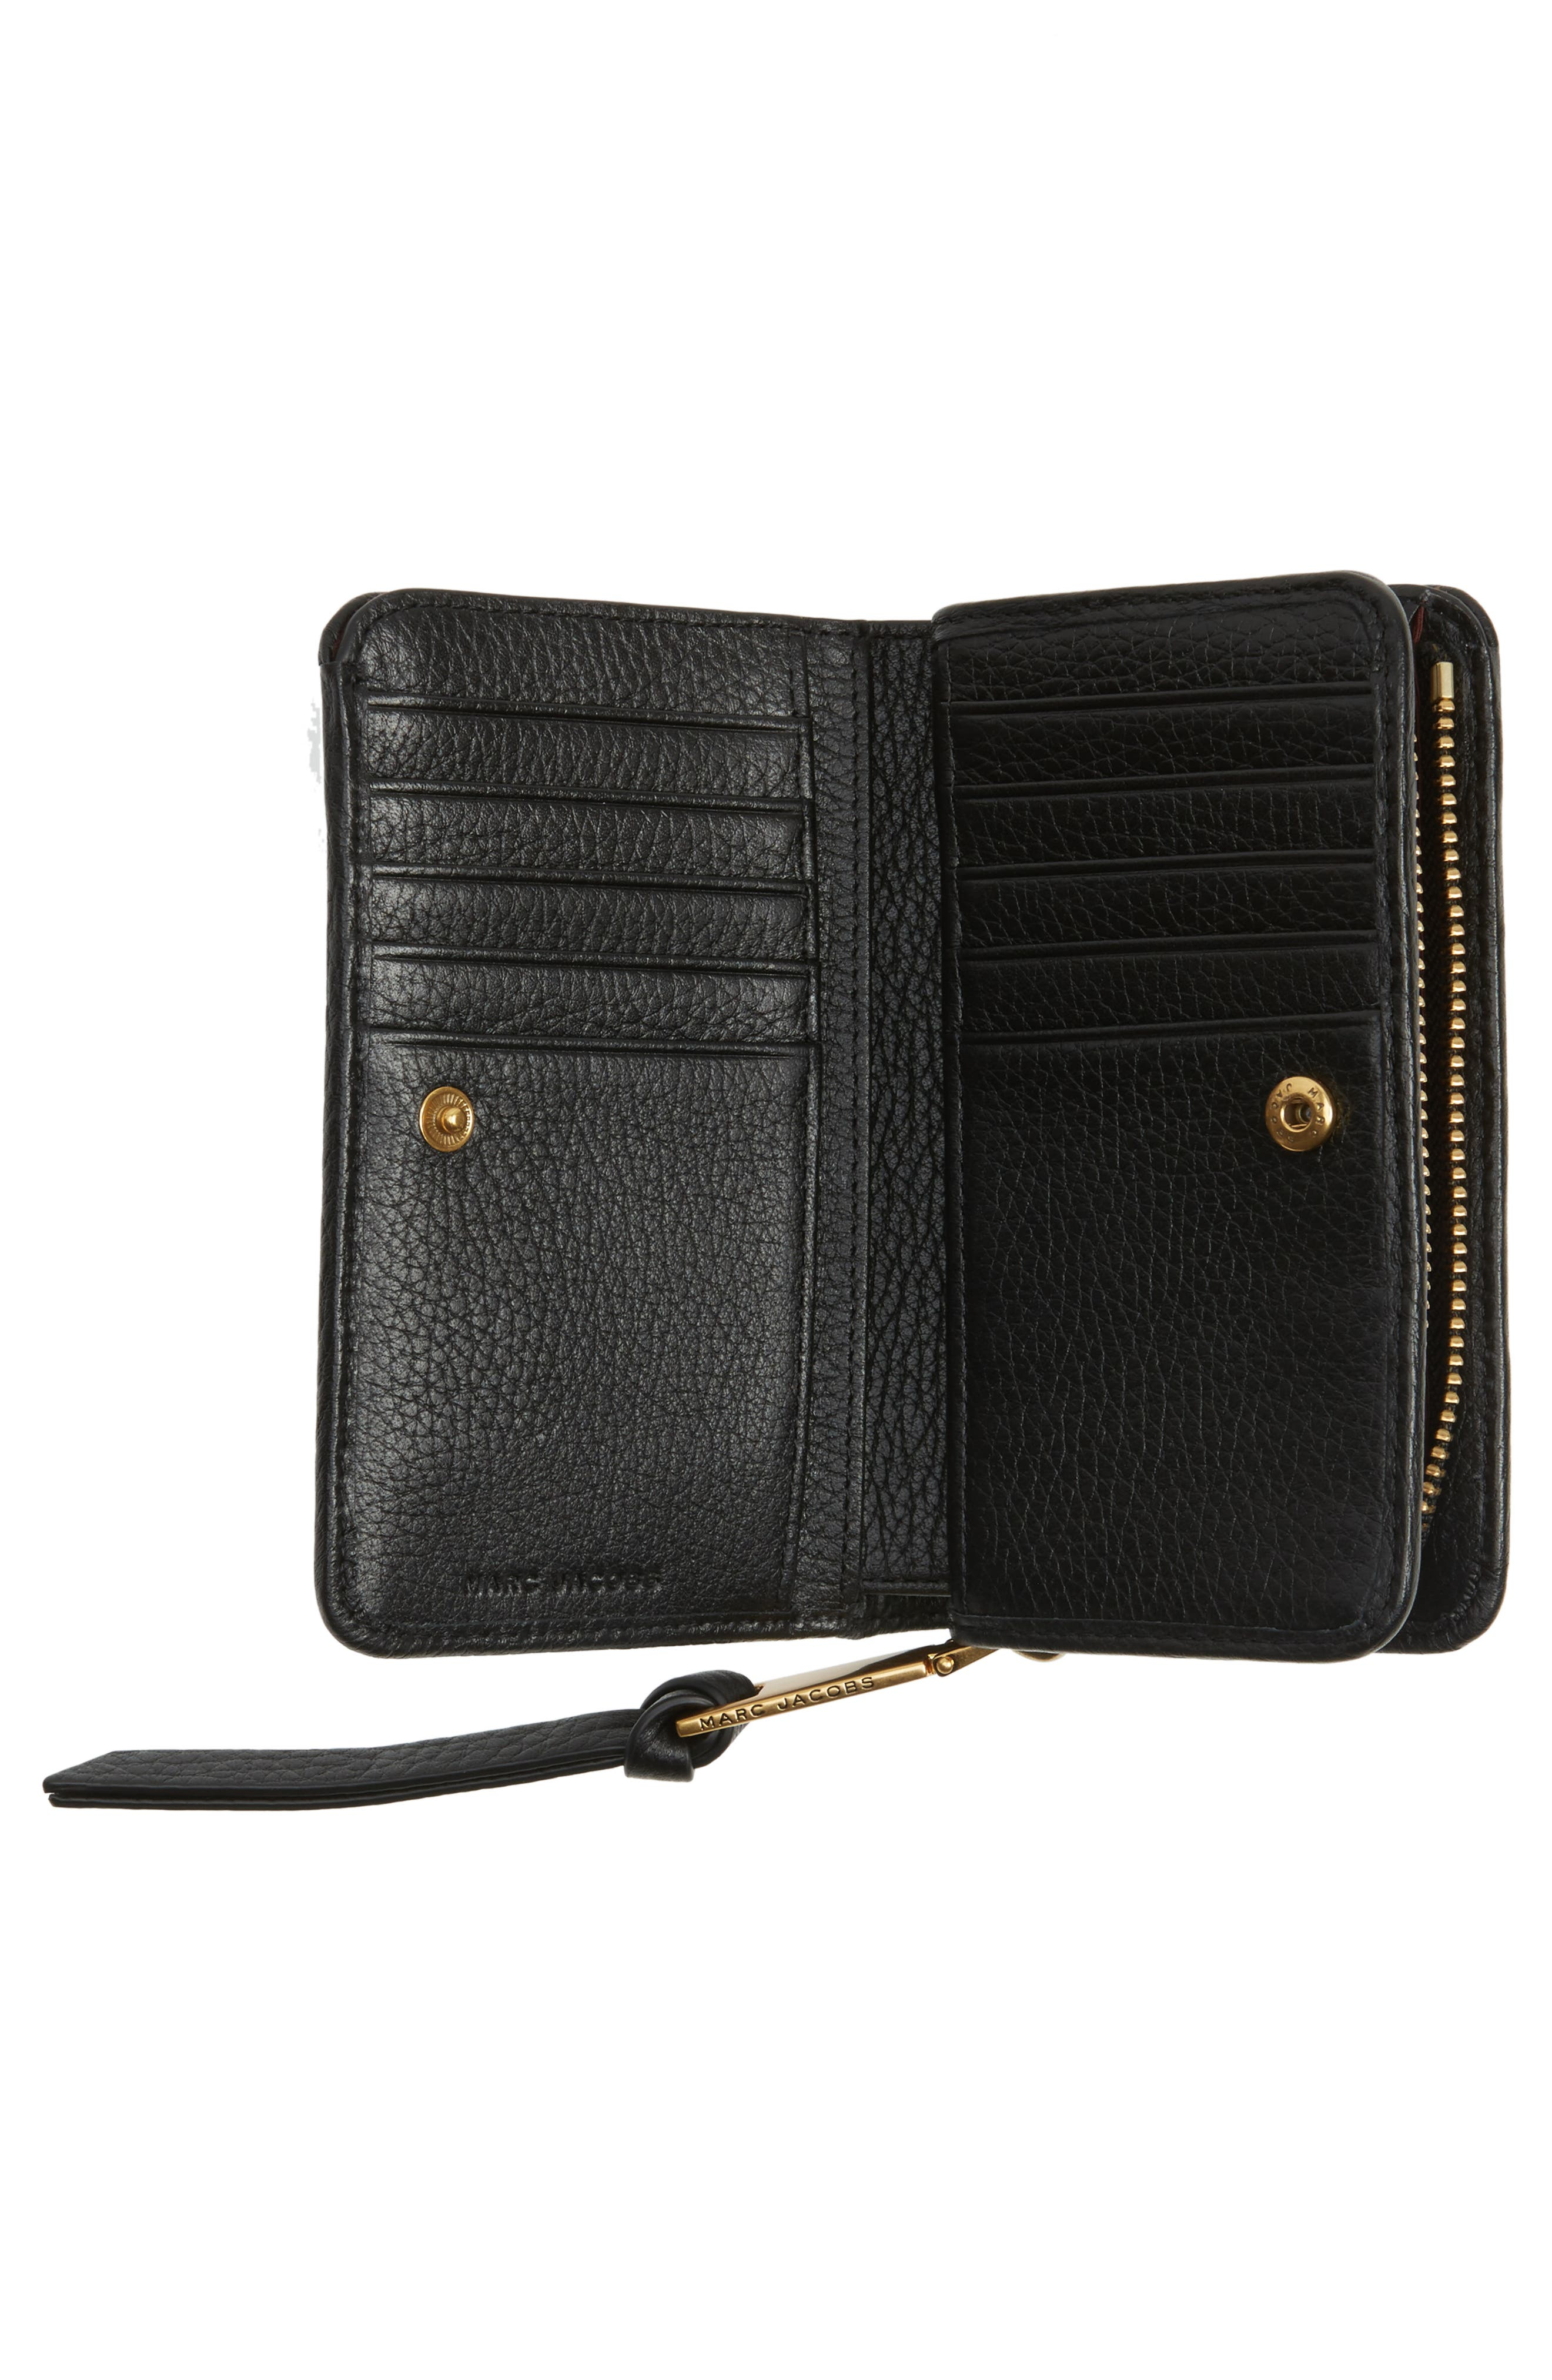 Recruit Compact Wallet,                             Alternate thumbnail 4, color,                             001